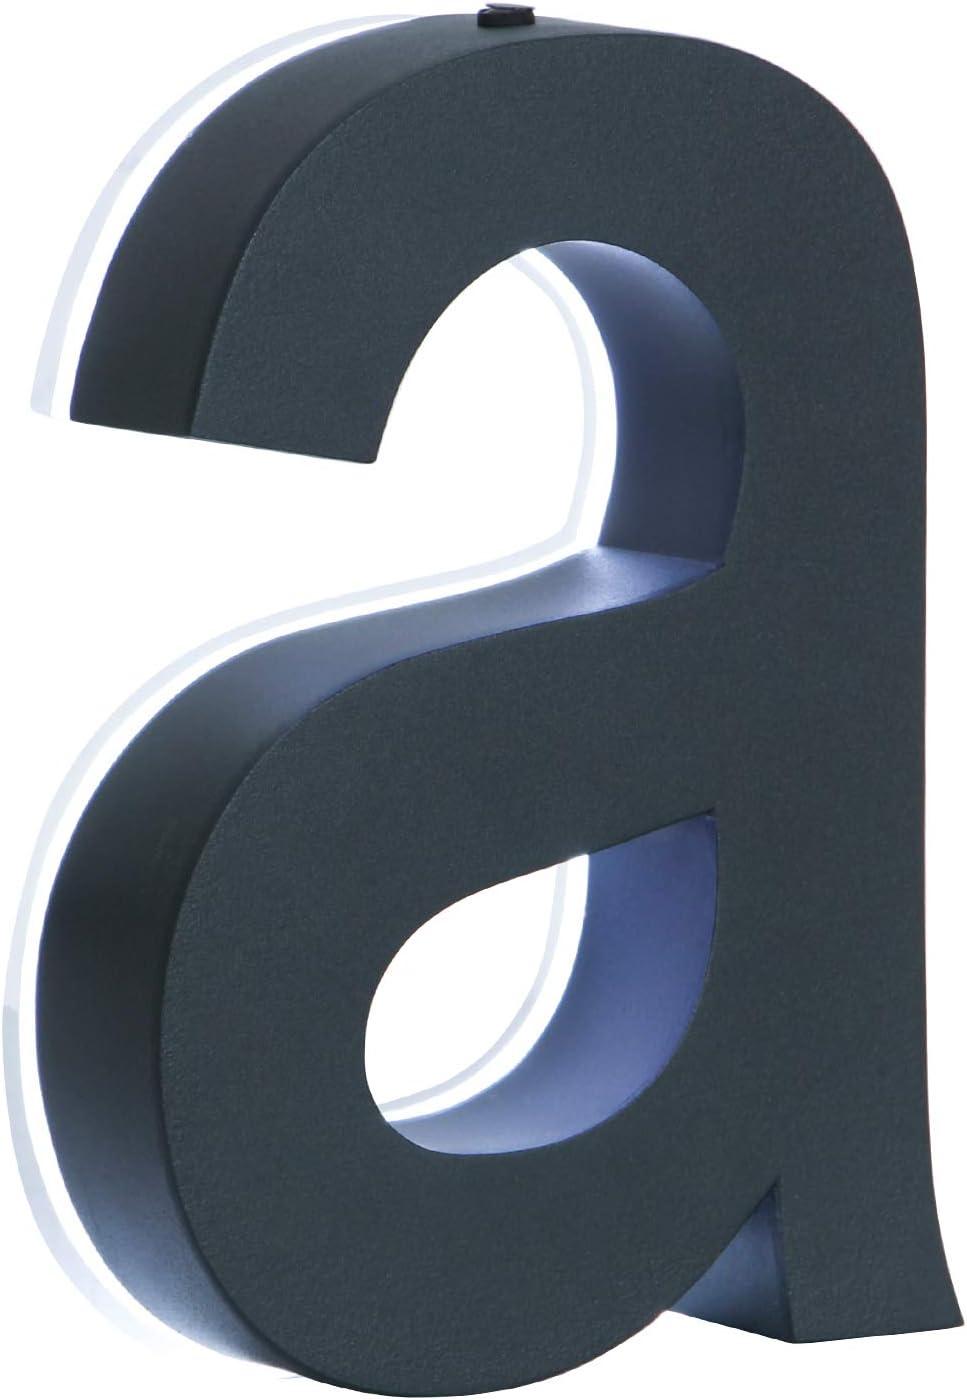 2 LED Hausnummer anthrazit 3D Edelstahl V2A H/öhe 20cm beleuchtet rostfrei Tranformator 220 Volt D/ämmerungssensor vollautomatisches An und Aus 0 1 2 3 4 5 6 7 8 9 a b c d 2 LED anthrazit